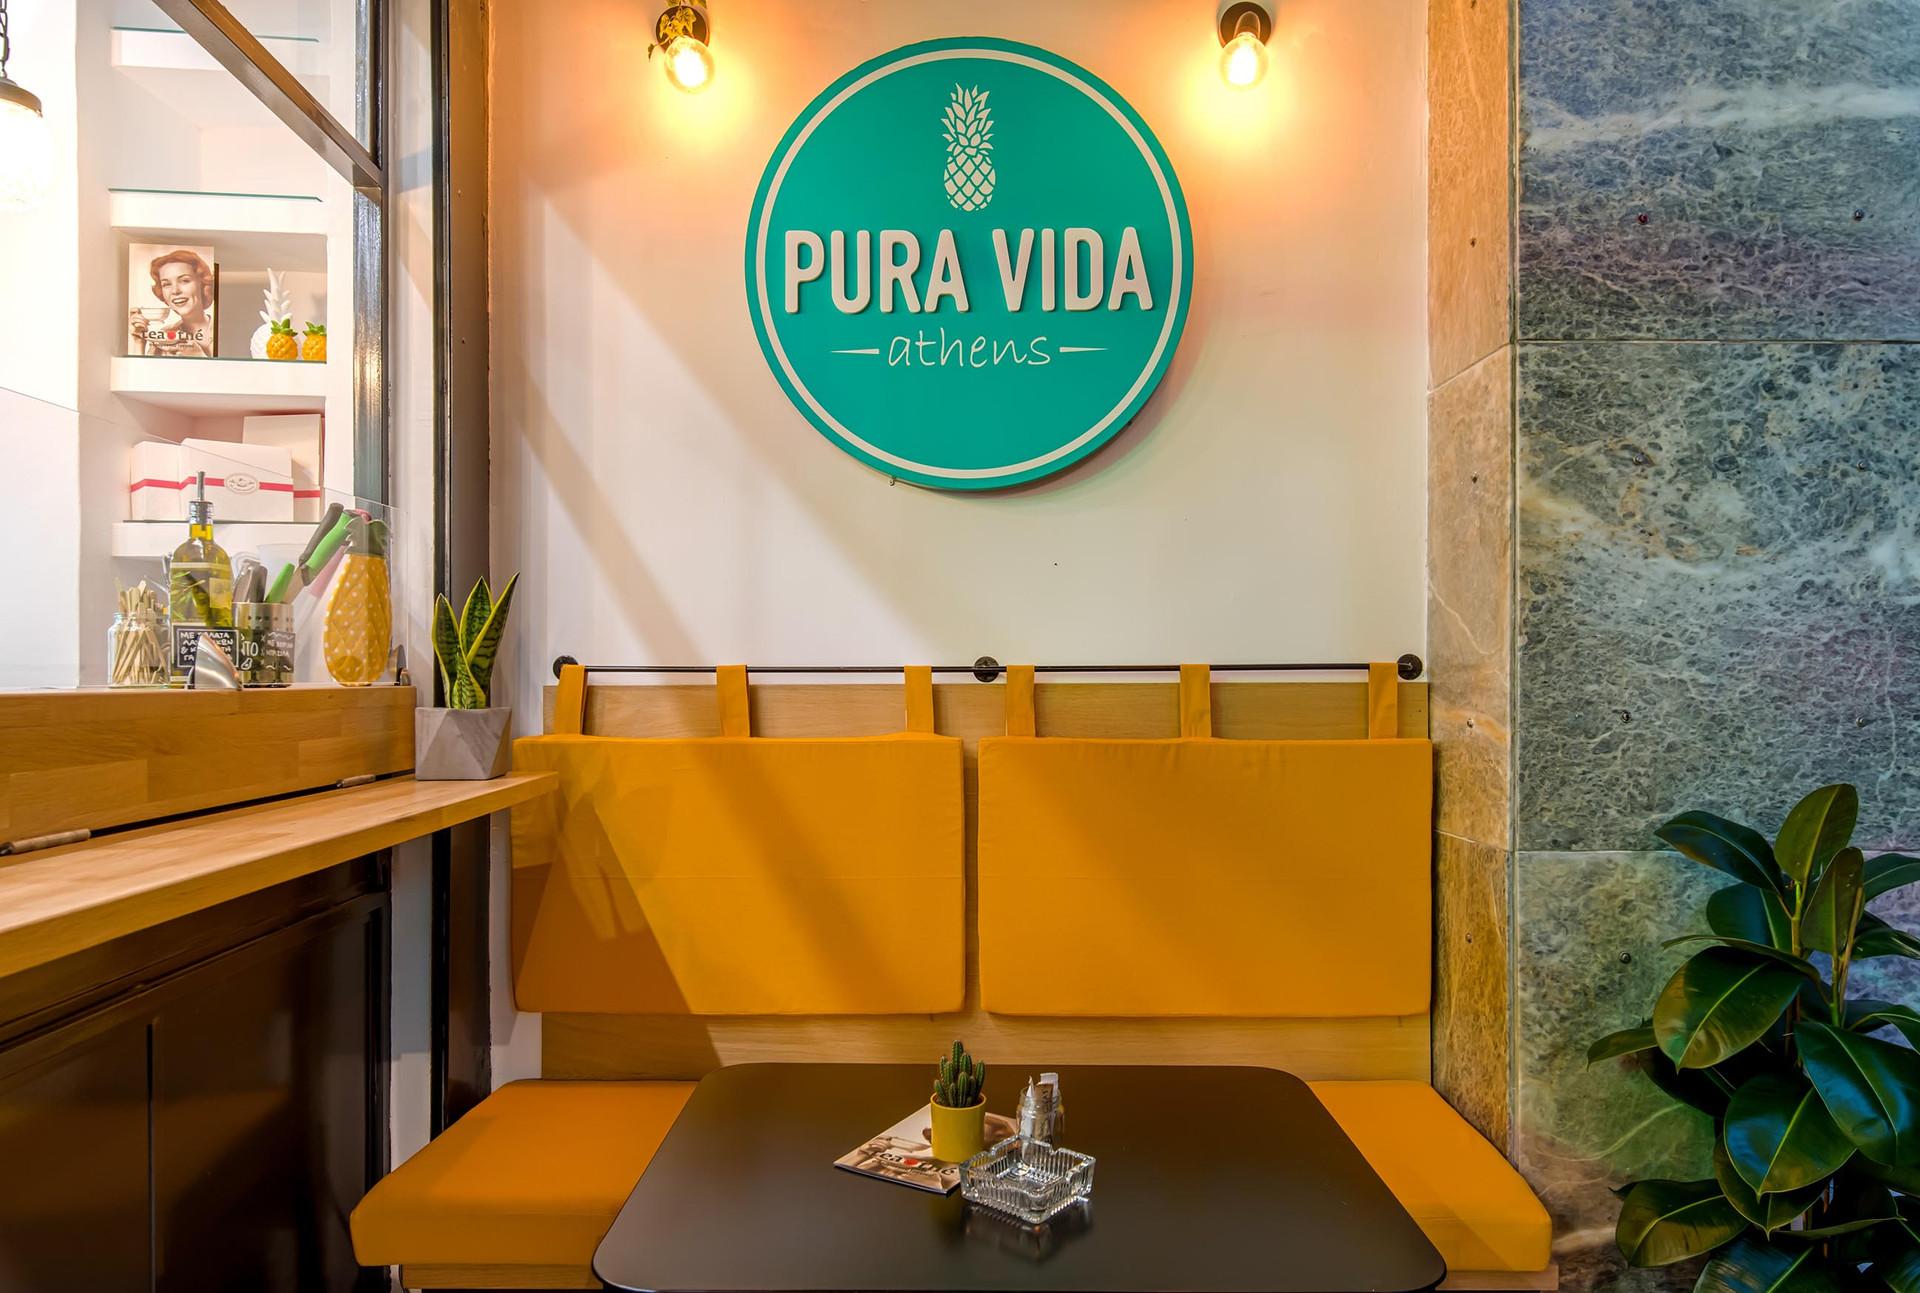 puravida_ (6).jpg